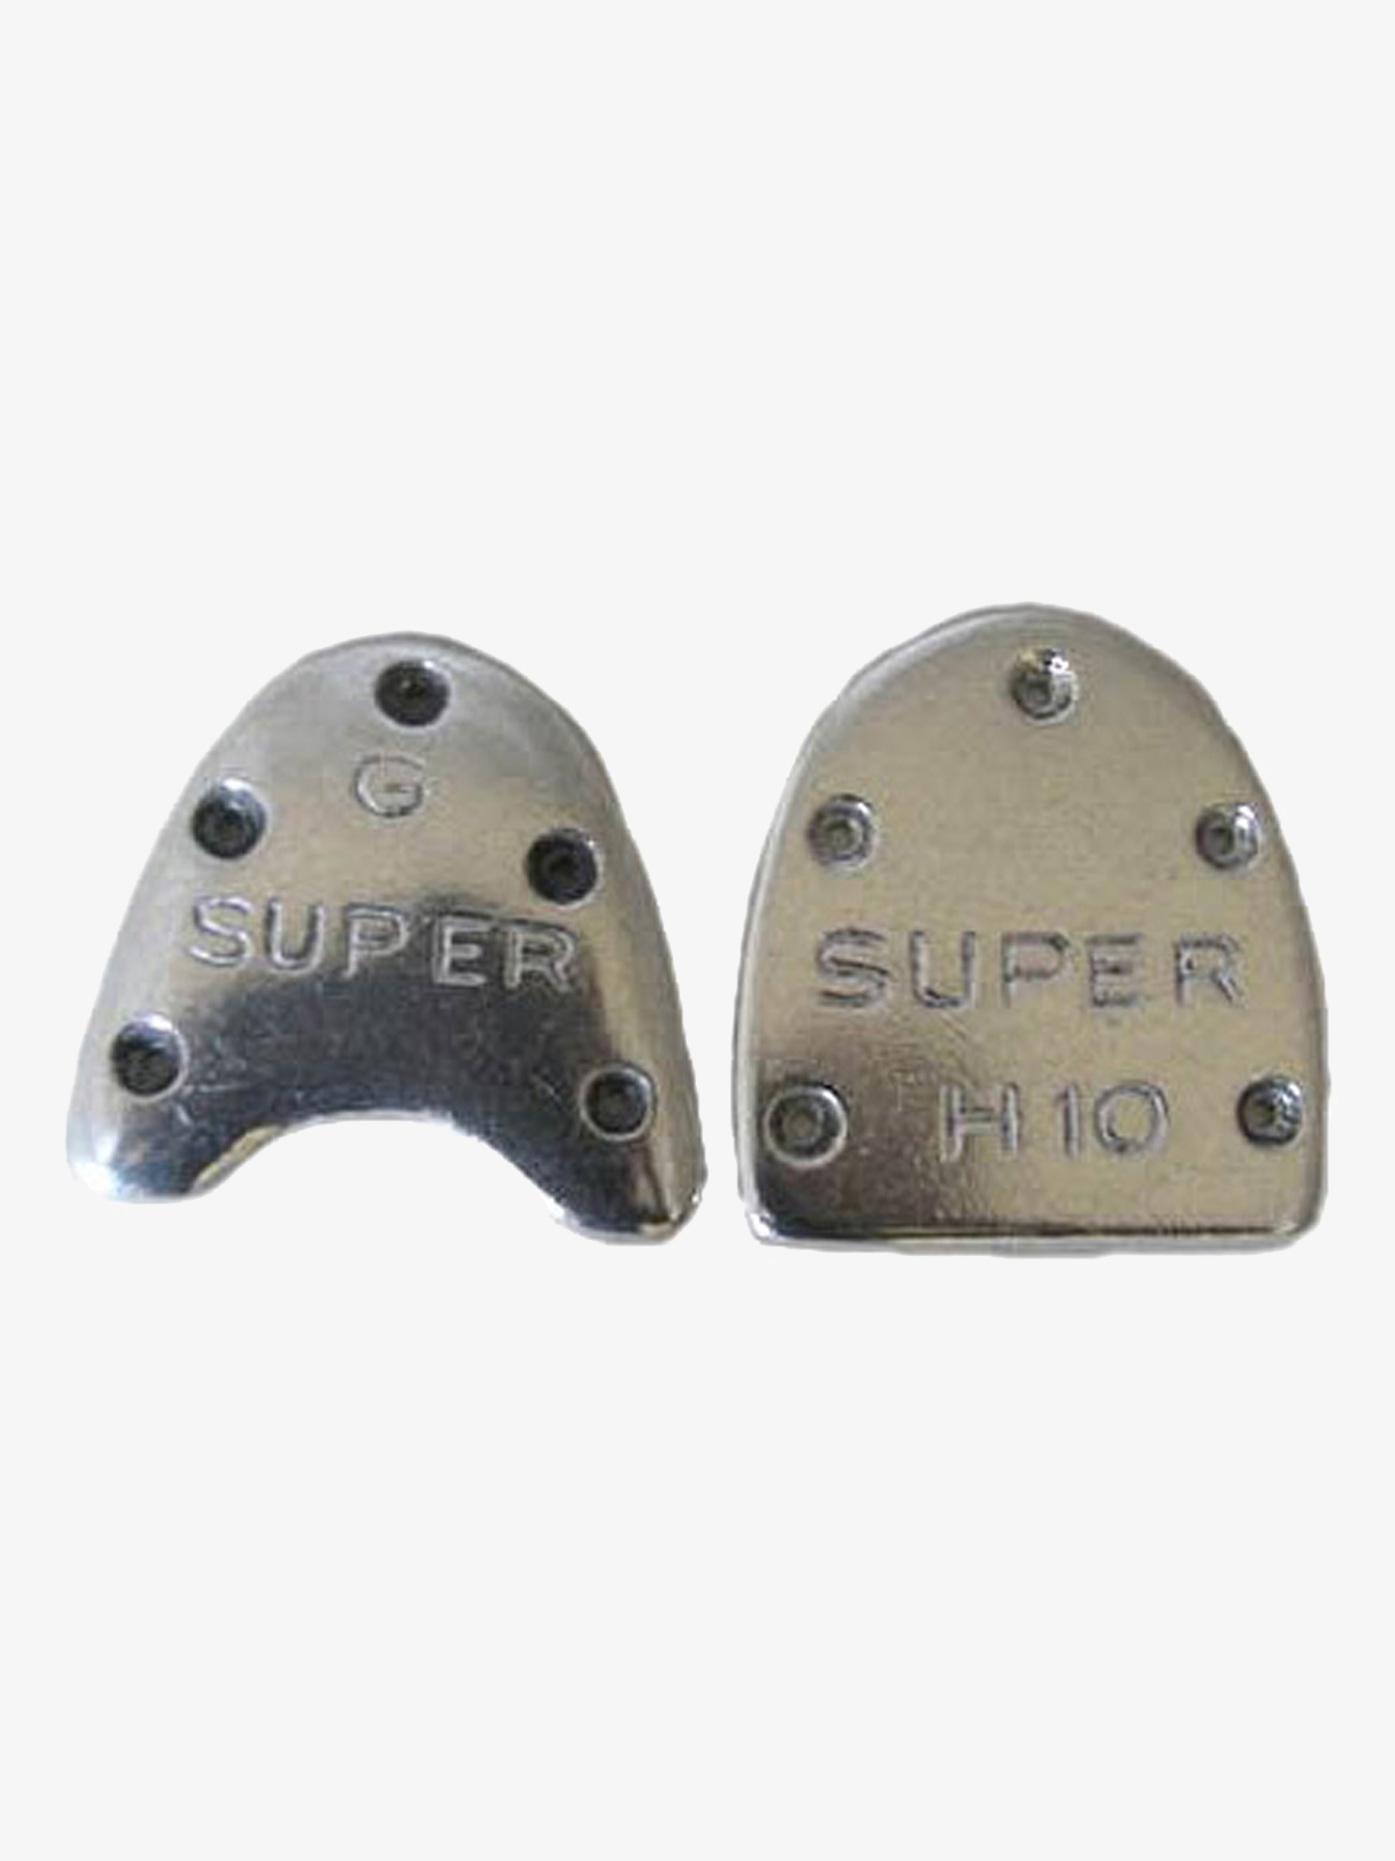 Danshuz Super Taps ST